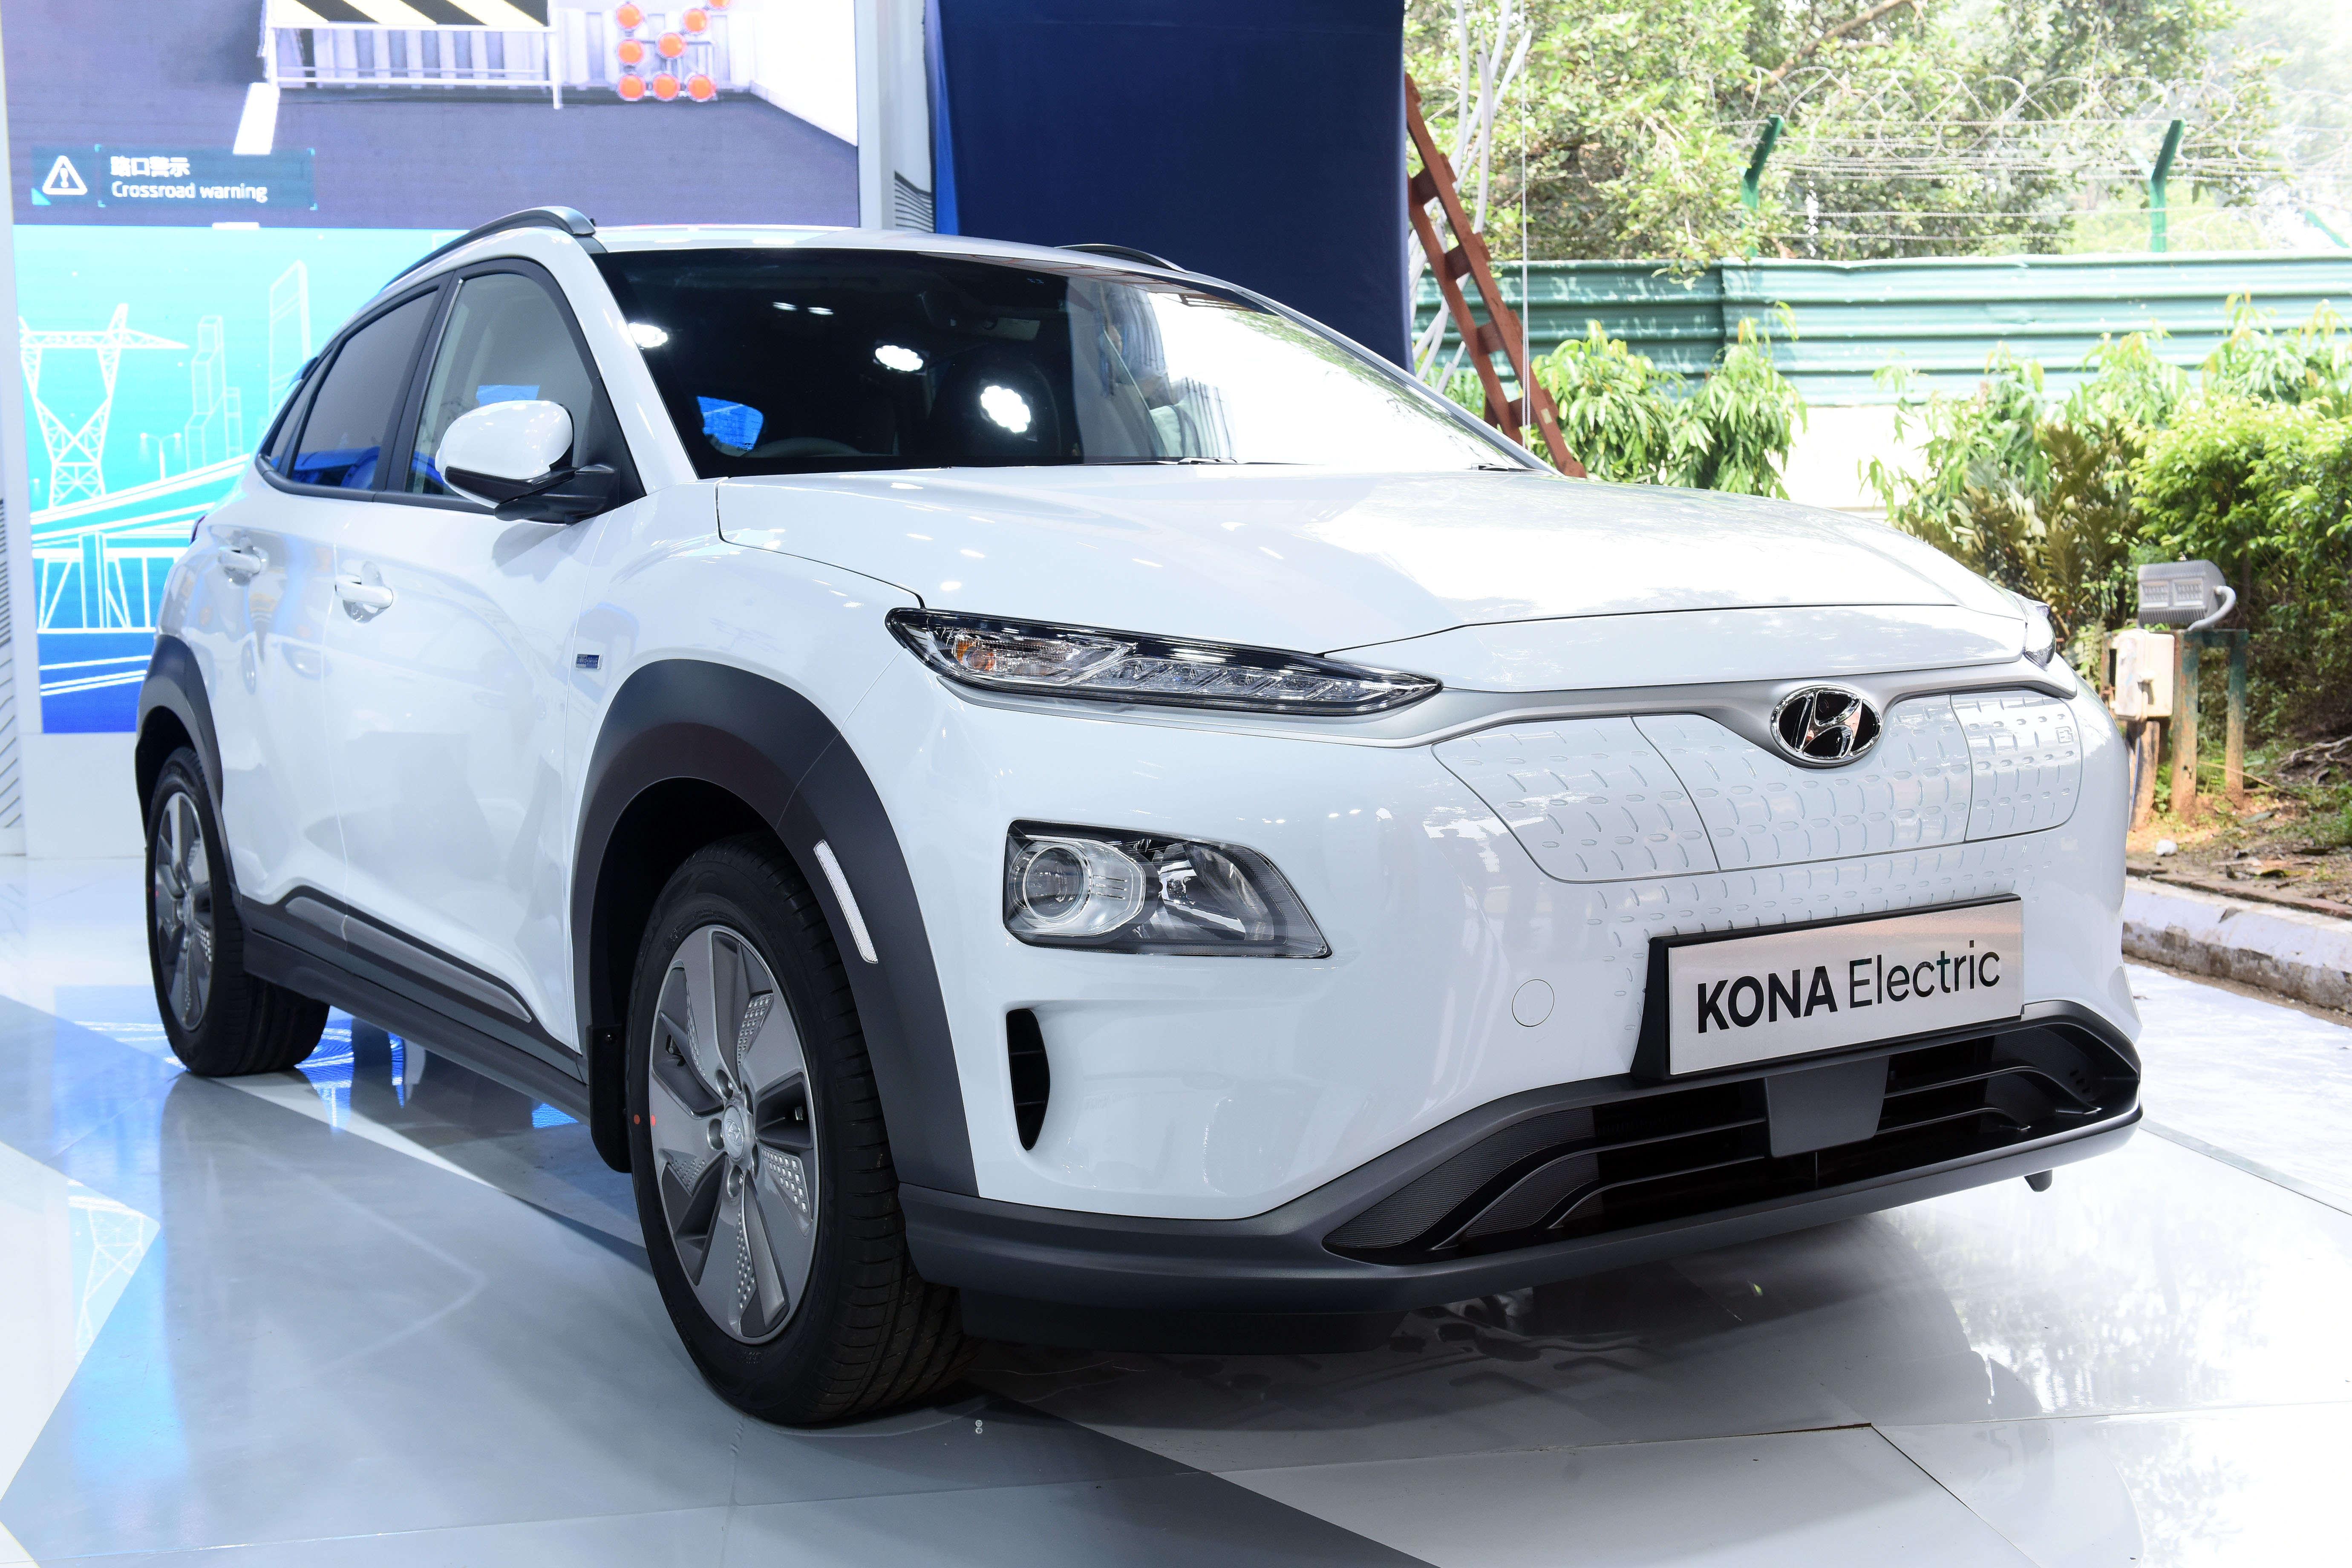 hyundai kona ev: Hyundai working with IOCL to provide fast charging